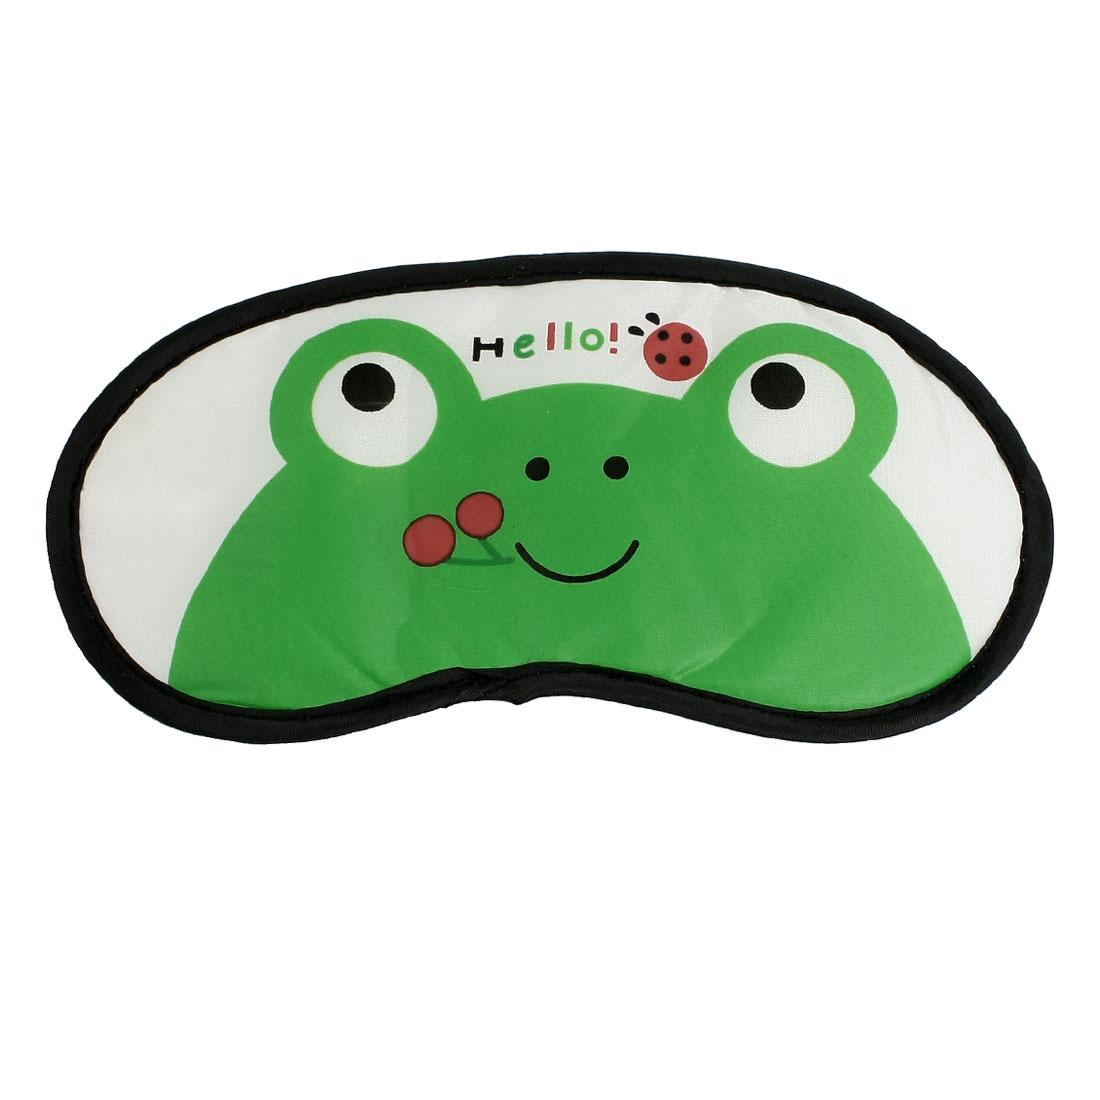 Cartoon Frog Pattern Blindfold Sleeping Eye Shade Mask Patch Green White